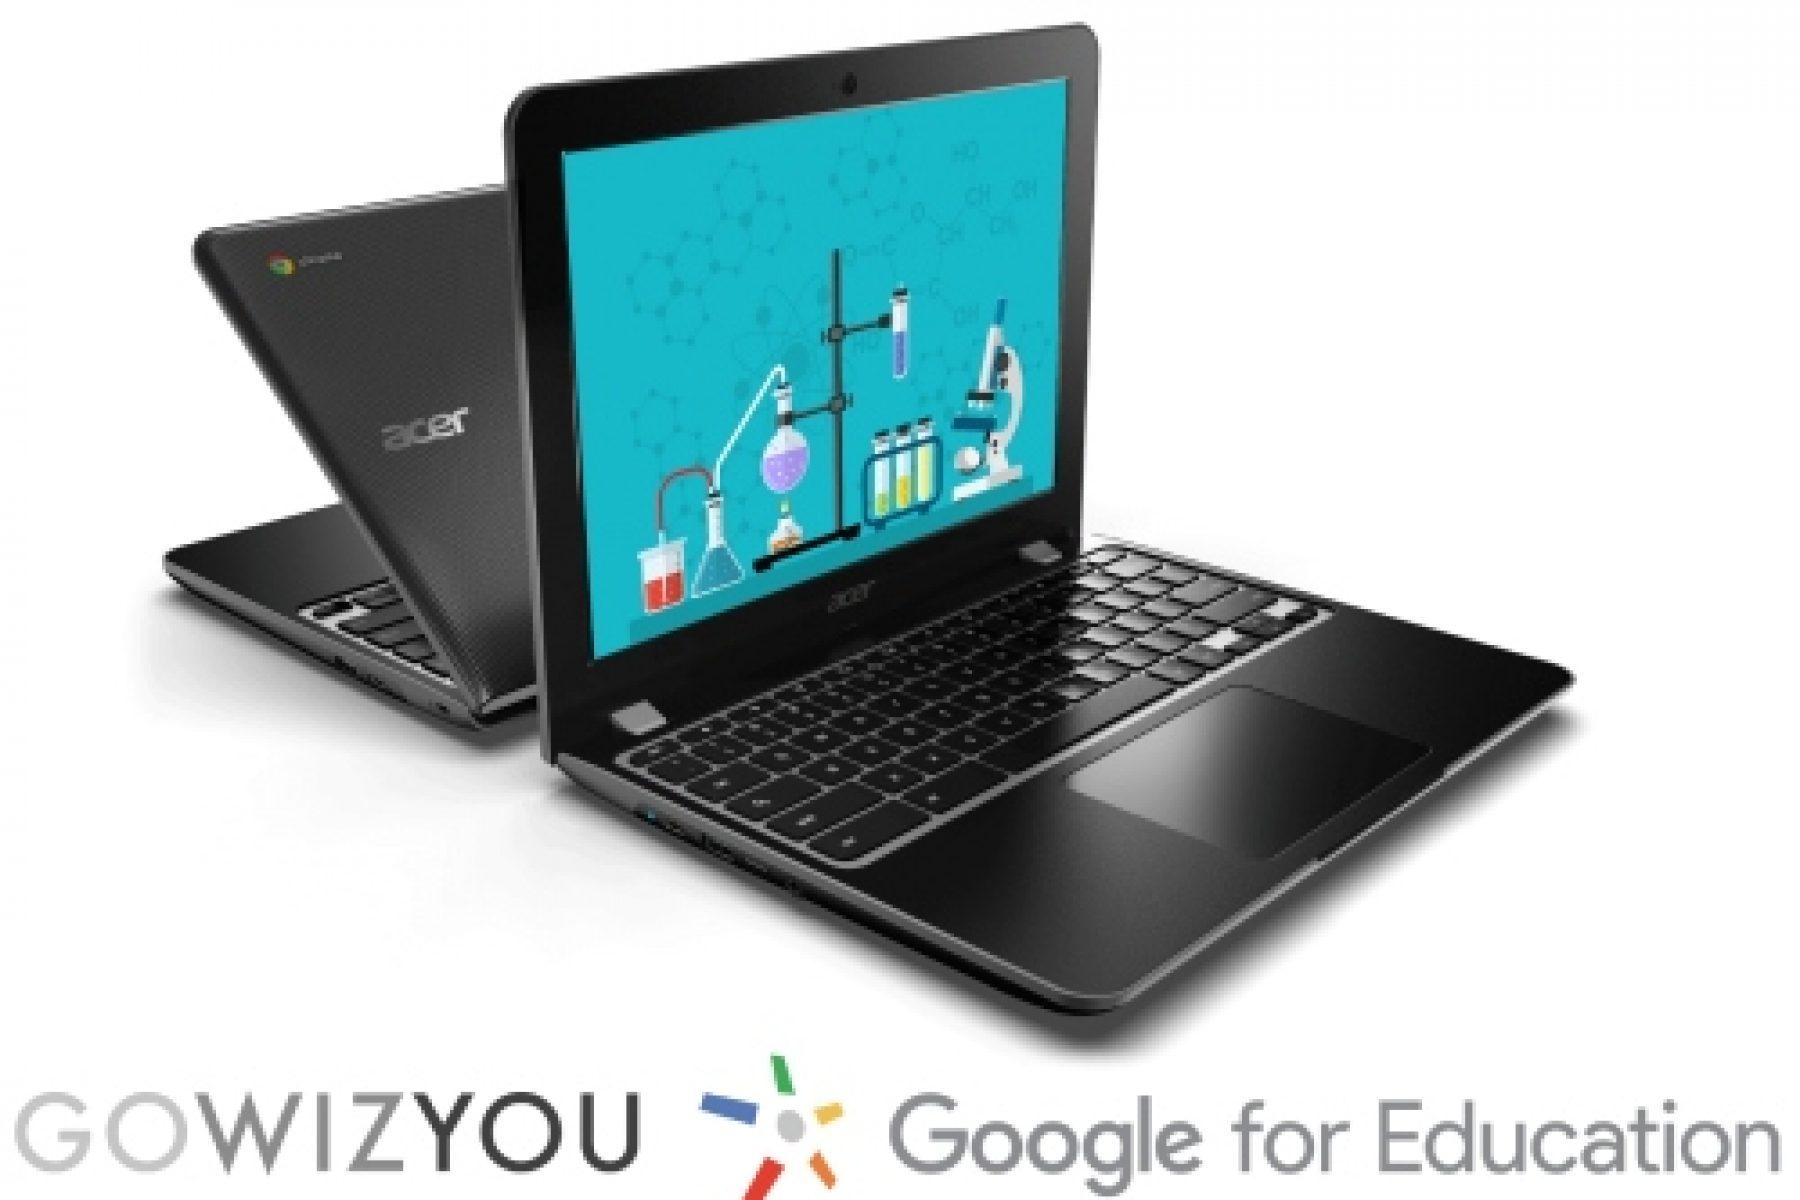 Gowizyou Google Education